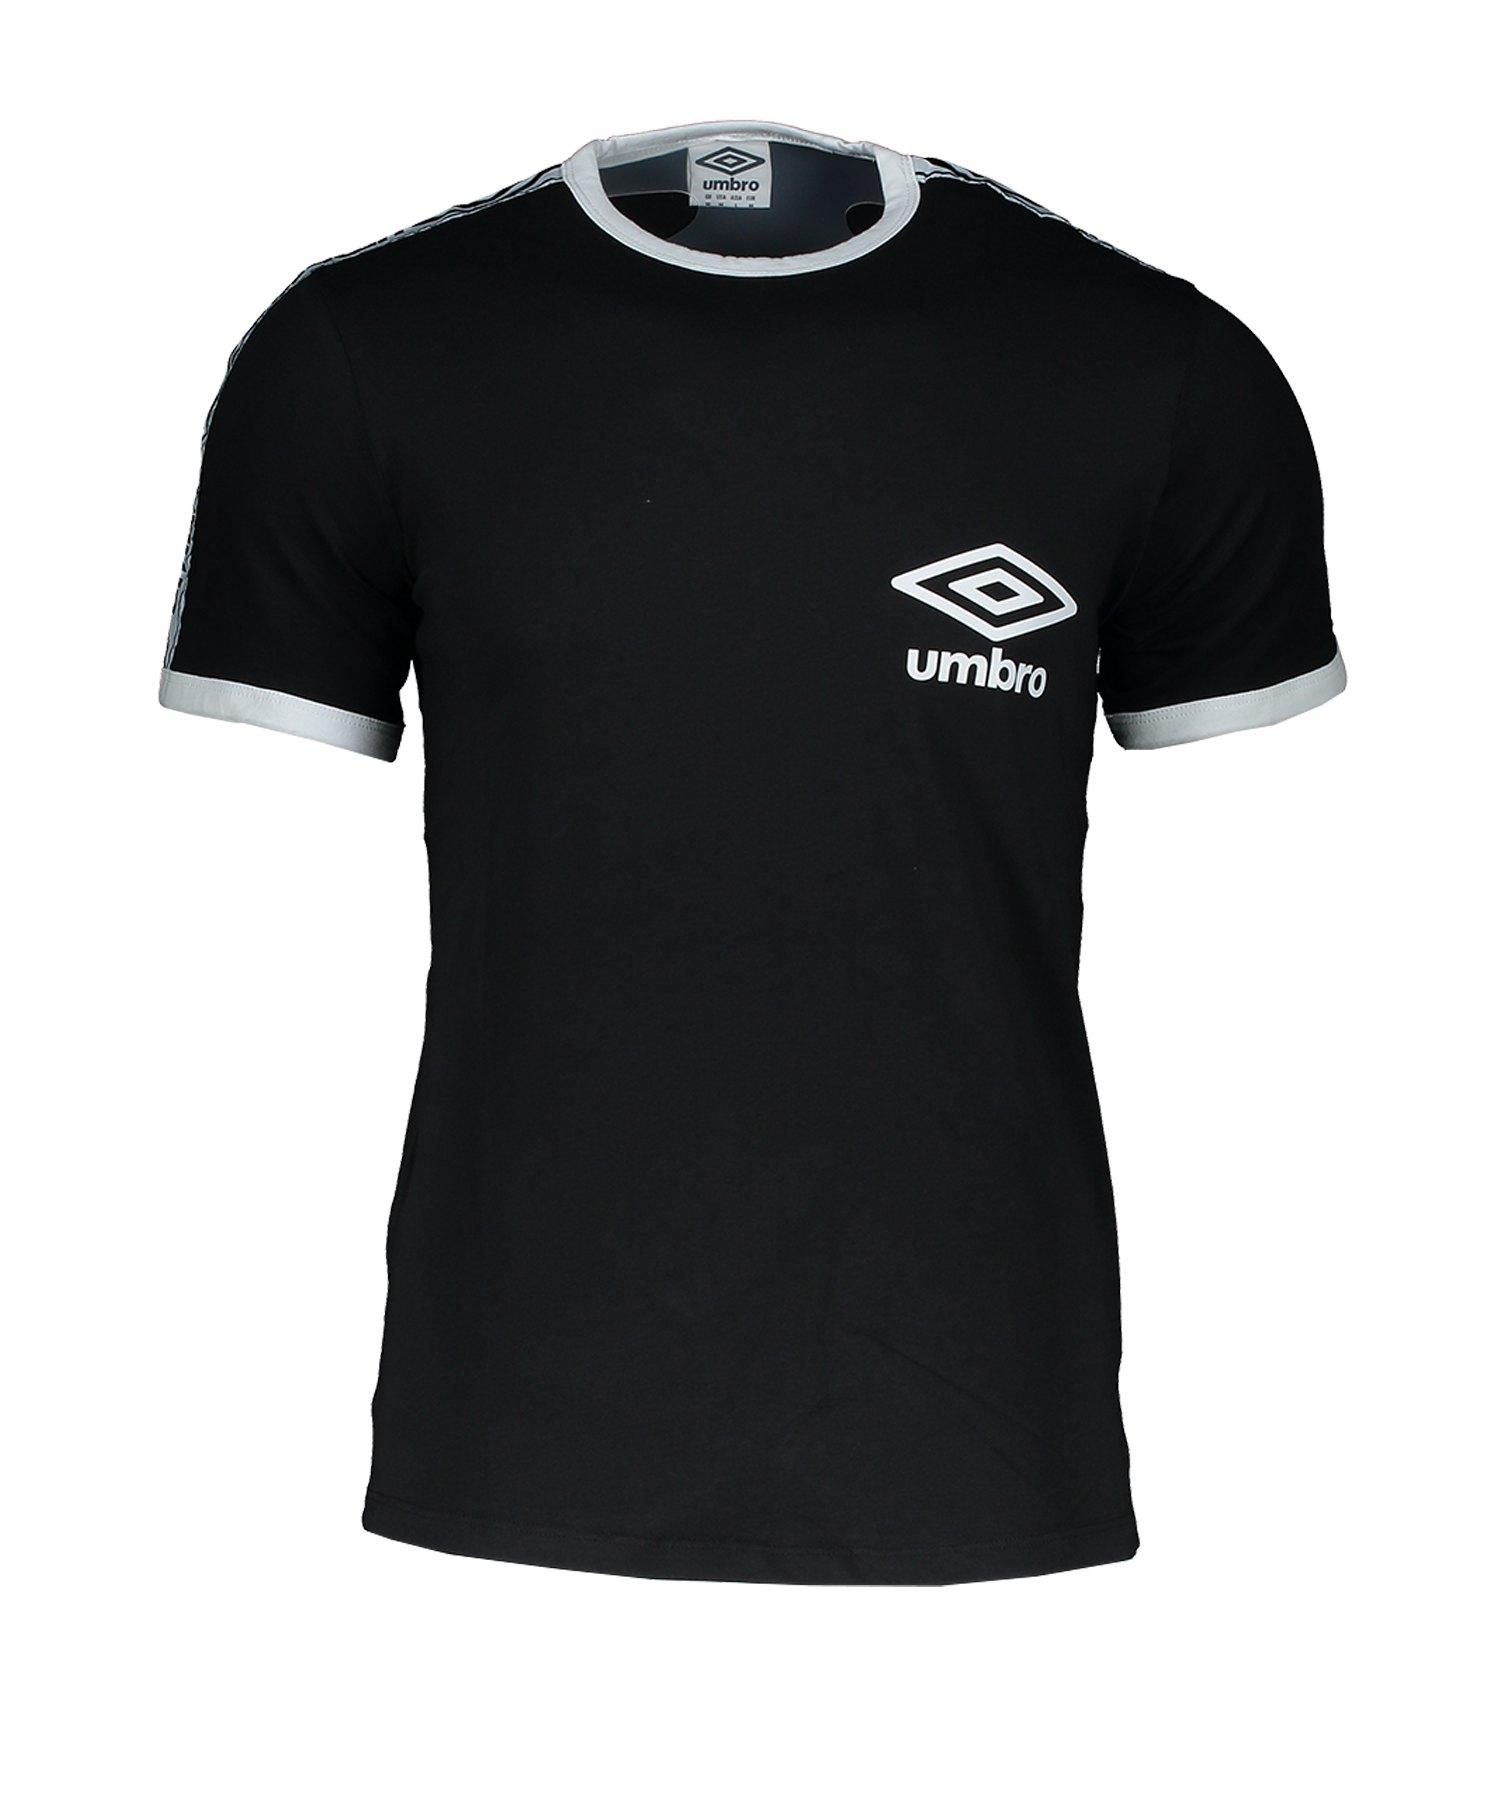 Umbro Taped Ringer T-Shirt Schwarz F060 - Schwarz